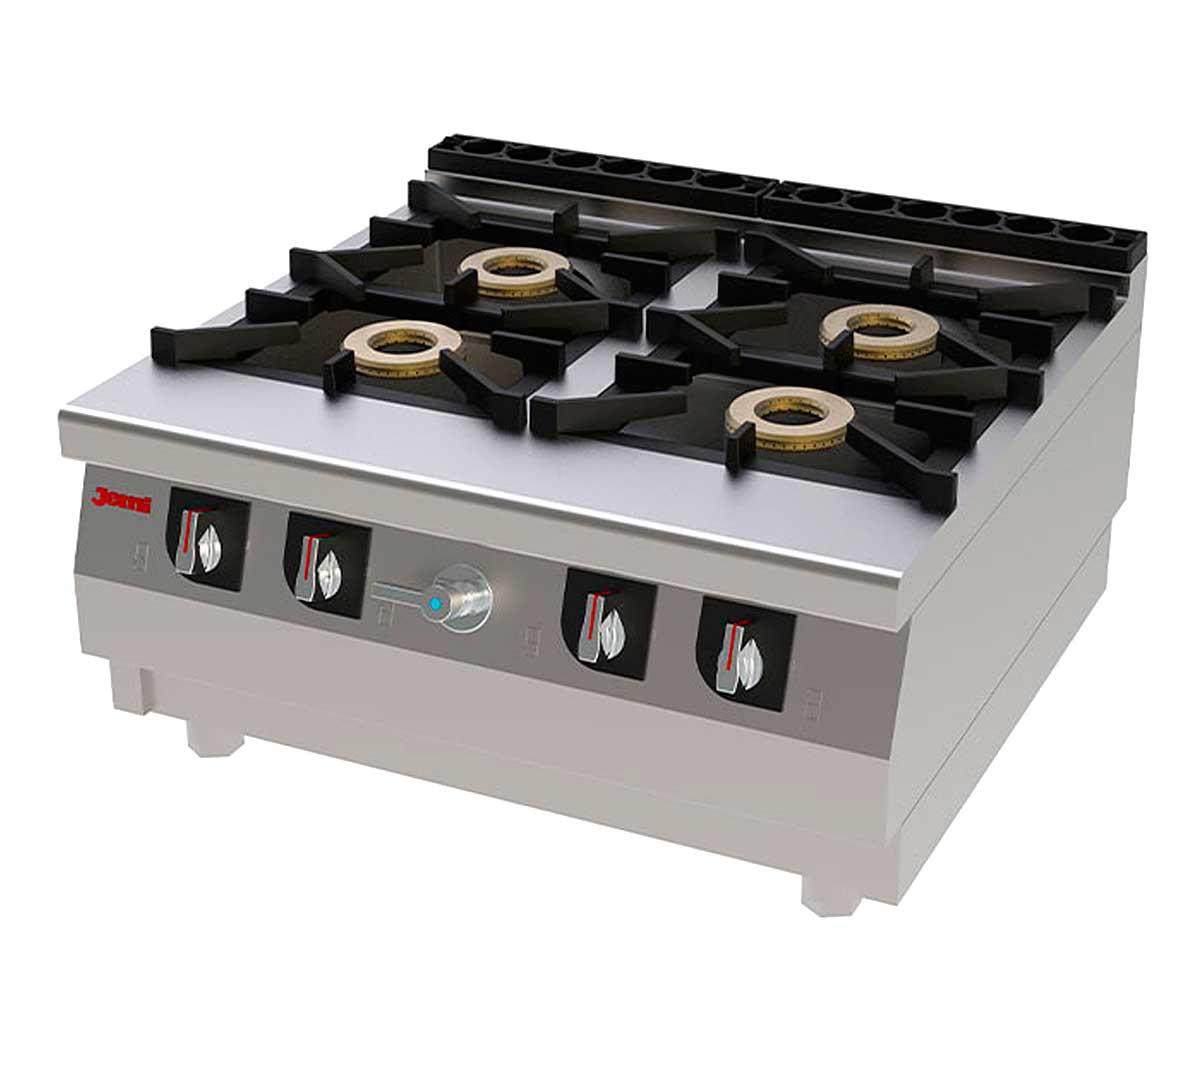 Cocina sobremesa jemi serie 750 chef - Fogones a gas ...